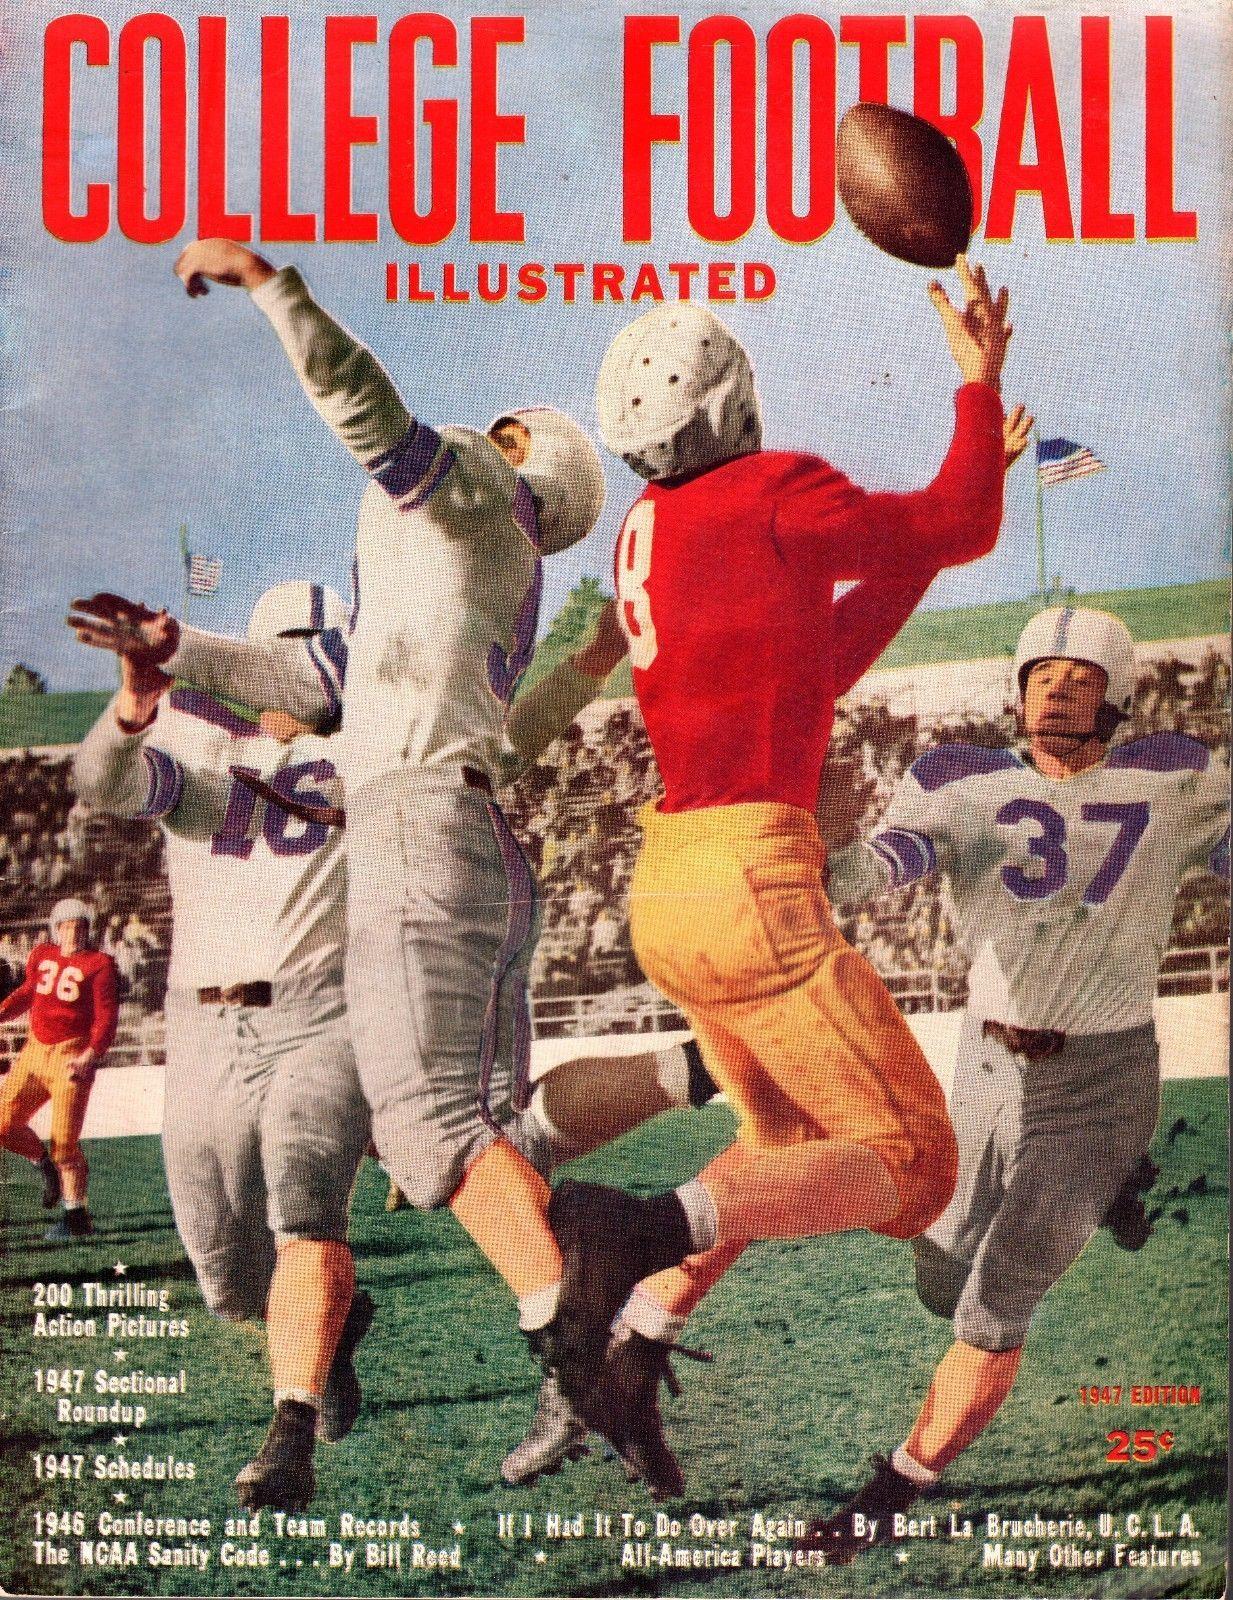 1947 College Football Illustrated Annual, magazine, Phil